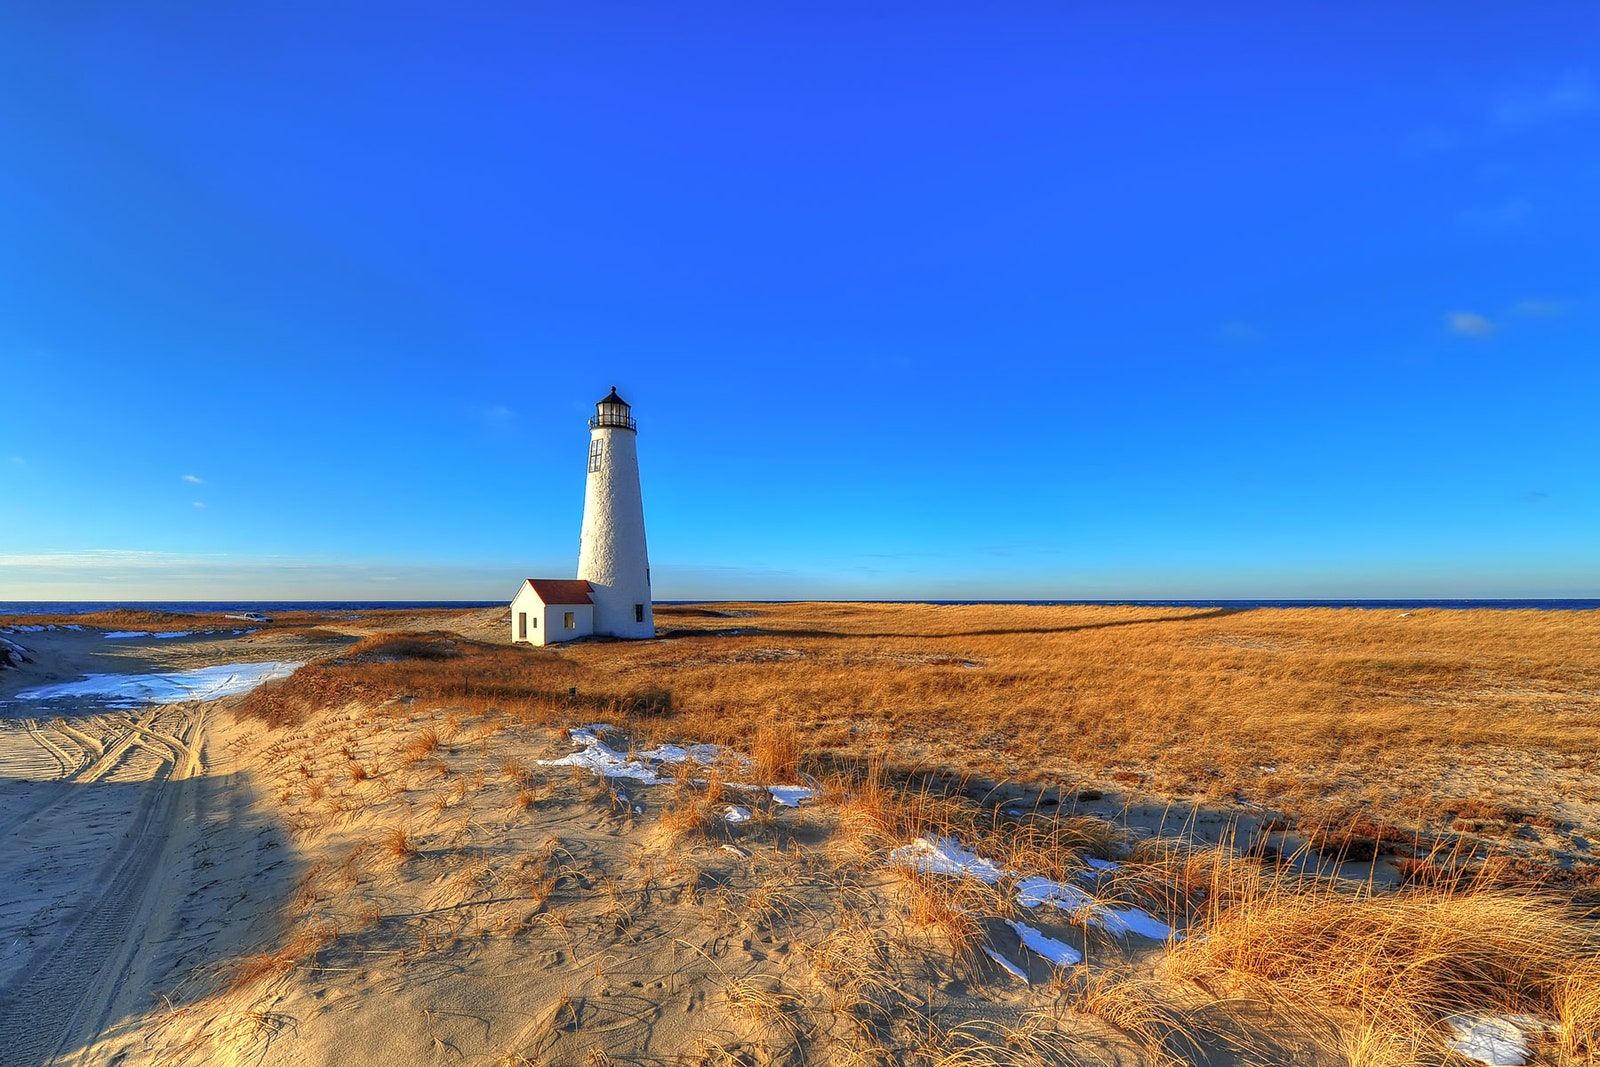 Great Point Light on Nantucket Island